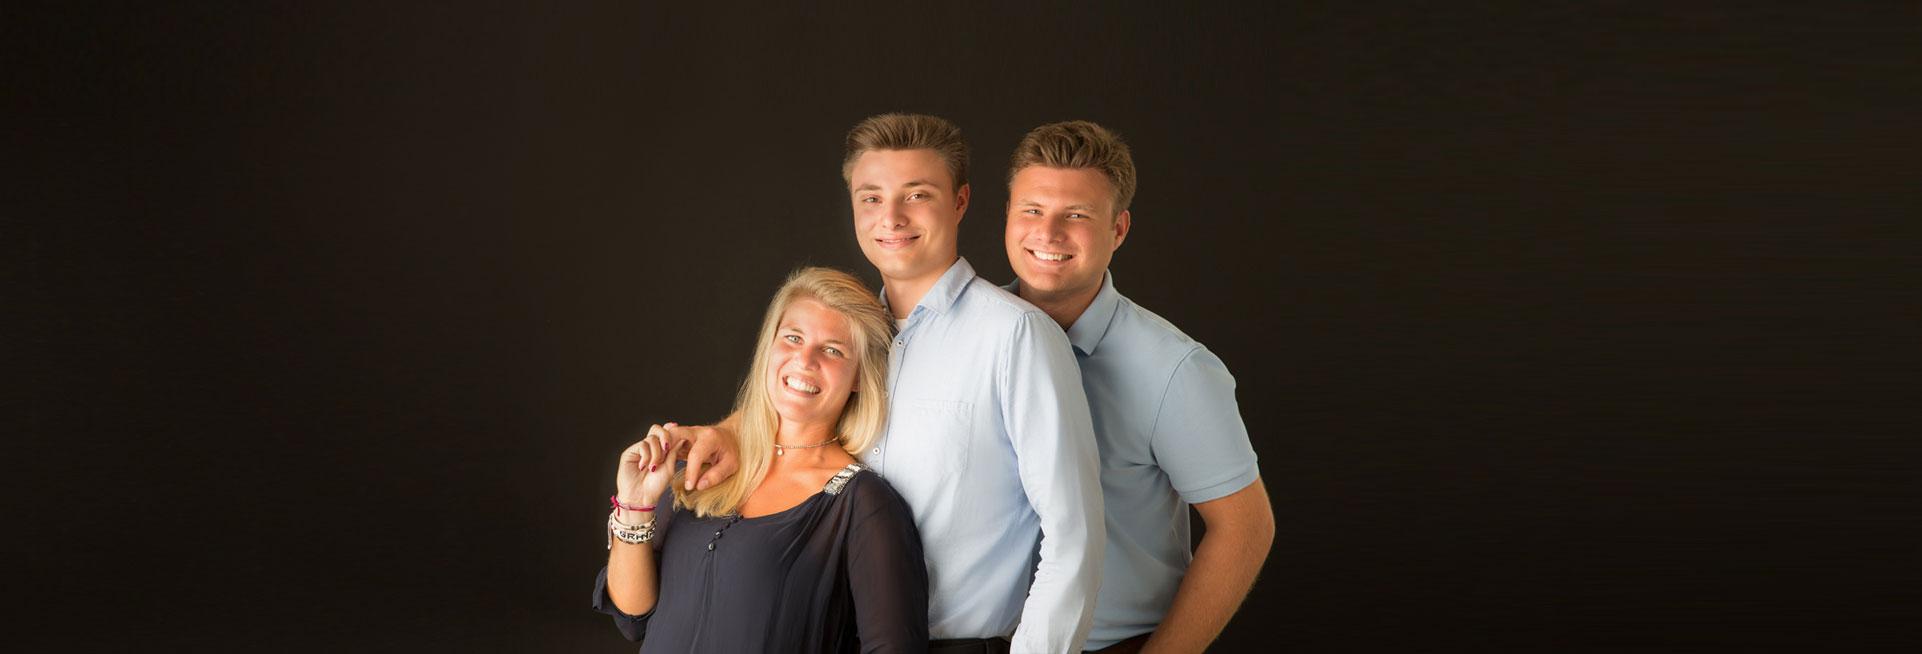 Familienfotos Eltern-Kind-Fotos Generationenfotos Fotograf Hannover